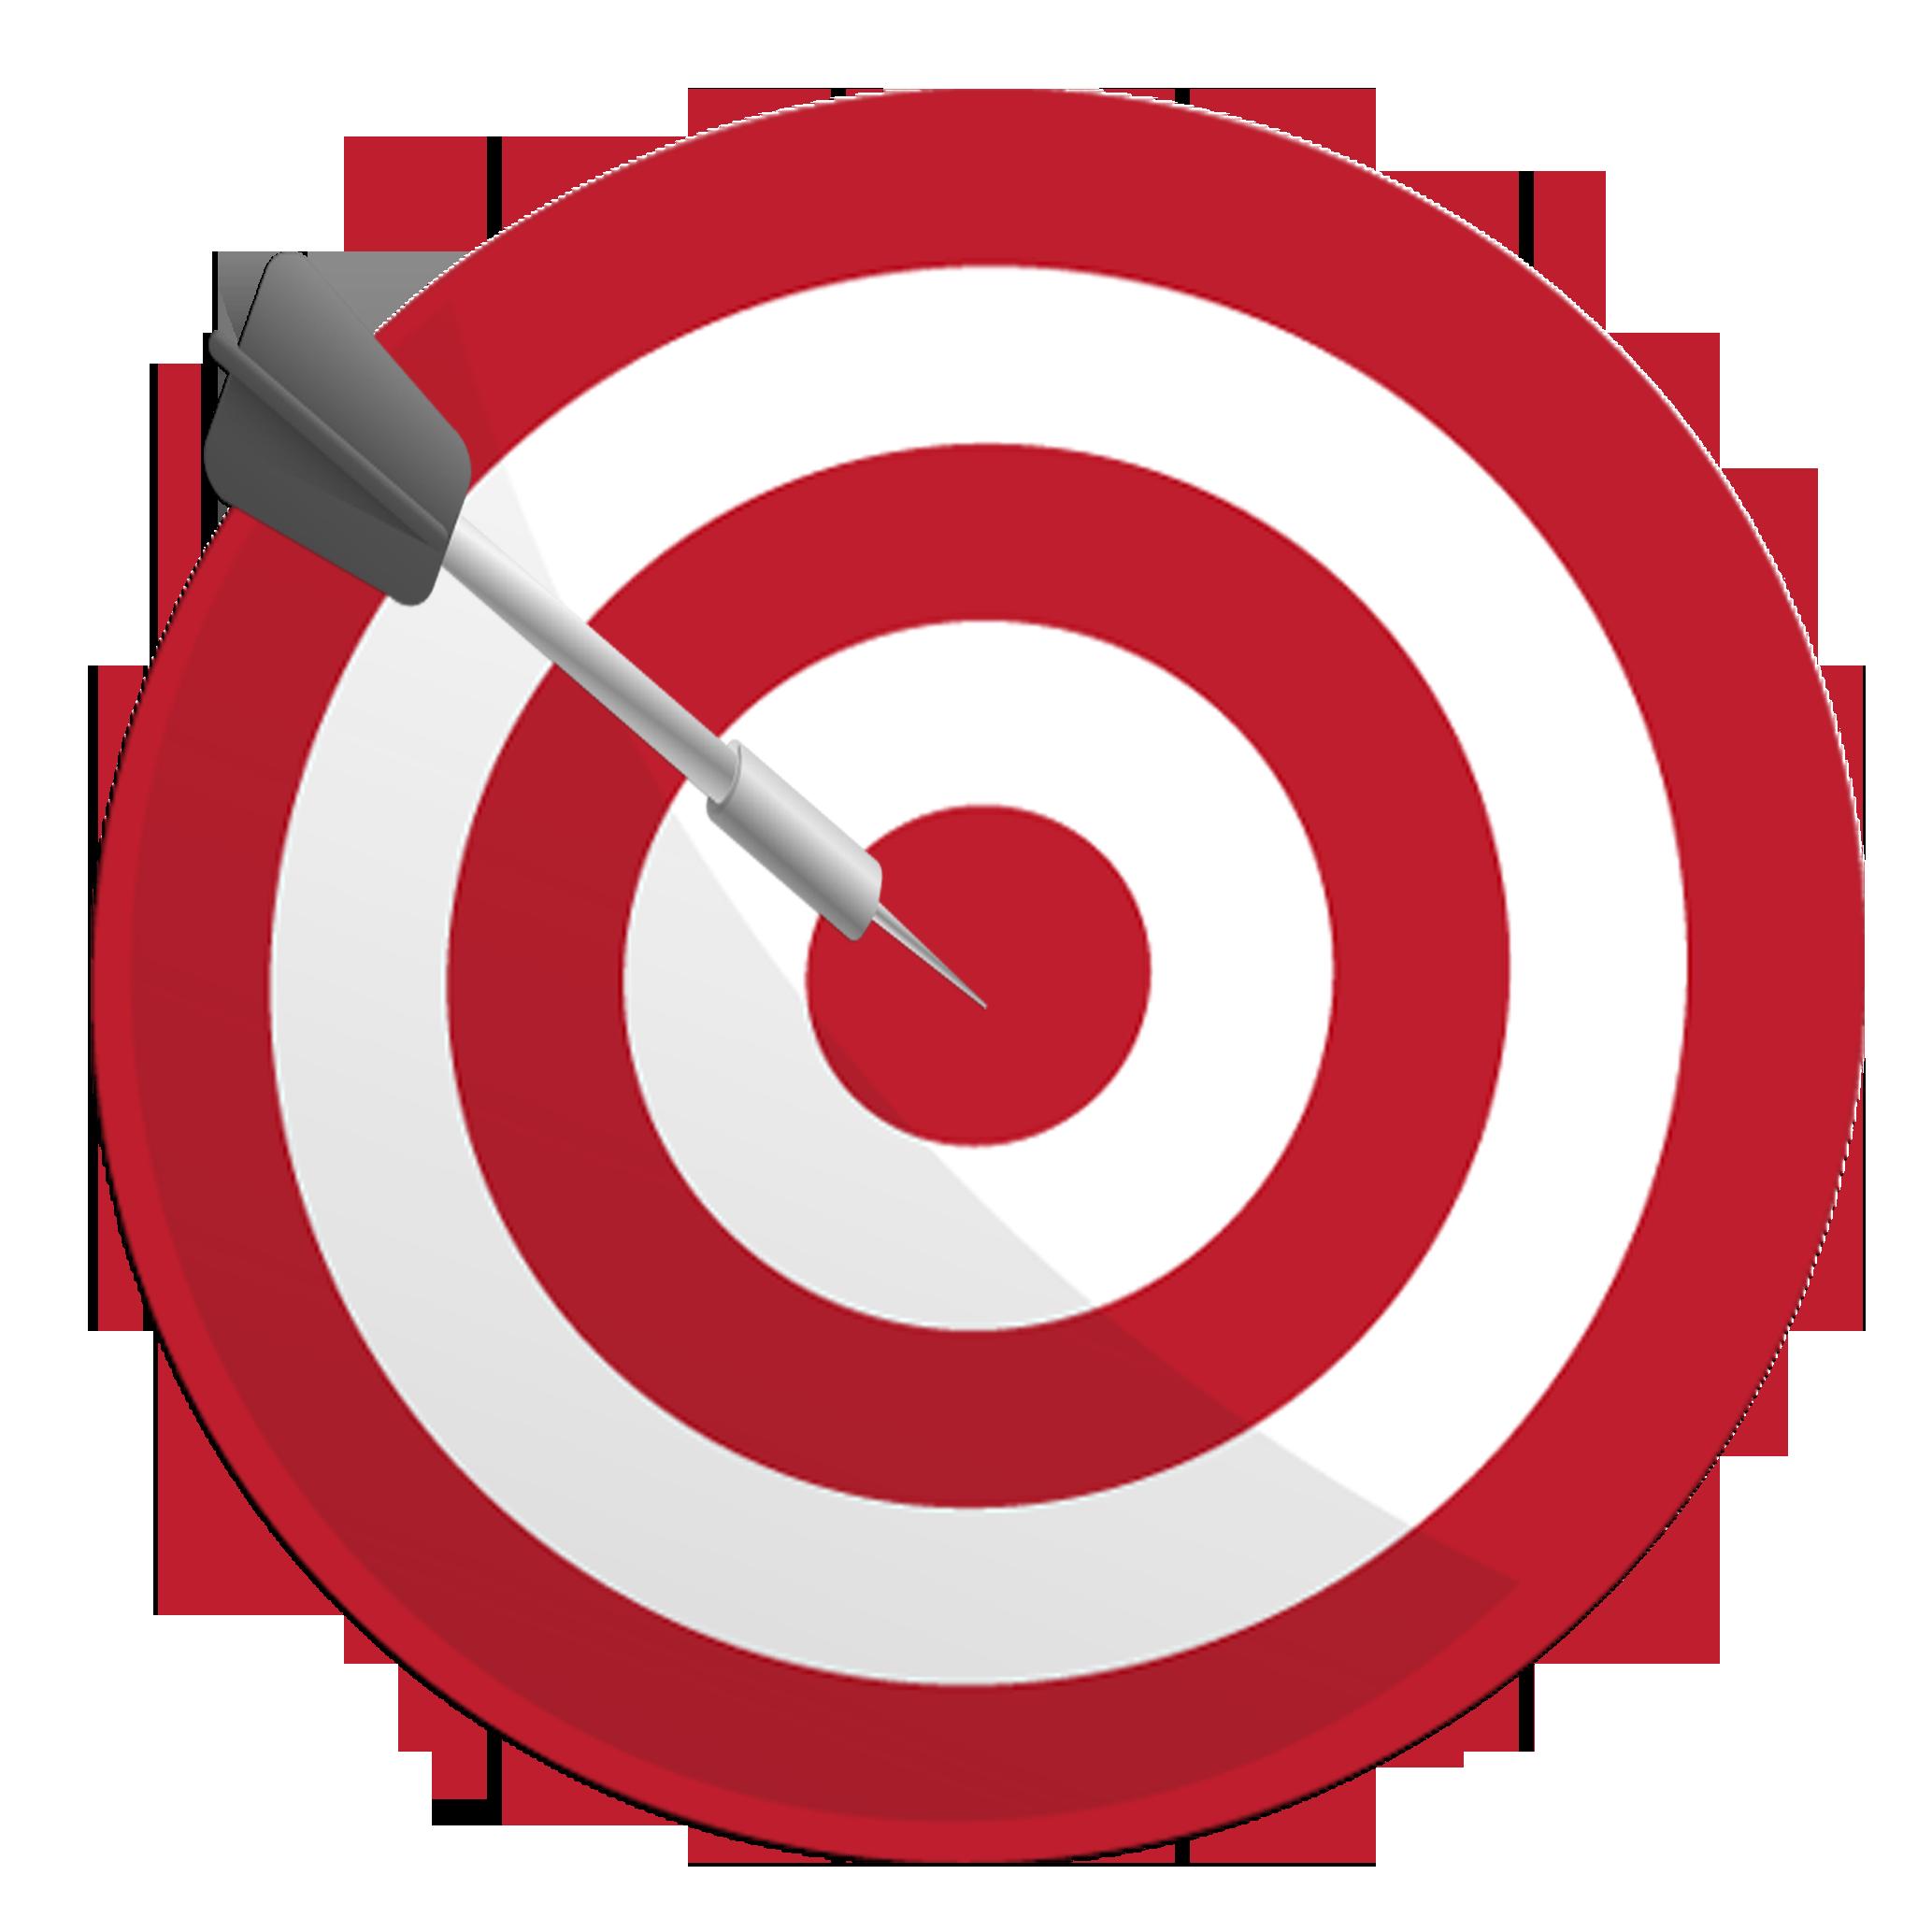 Dart clipart dartboard. With arrow png transparent